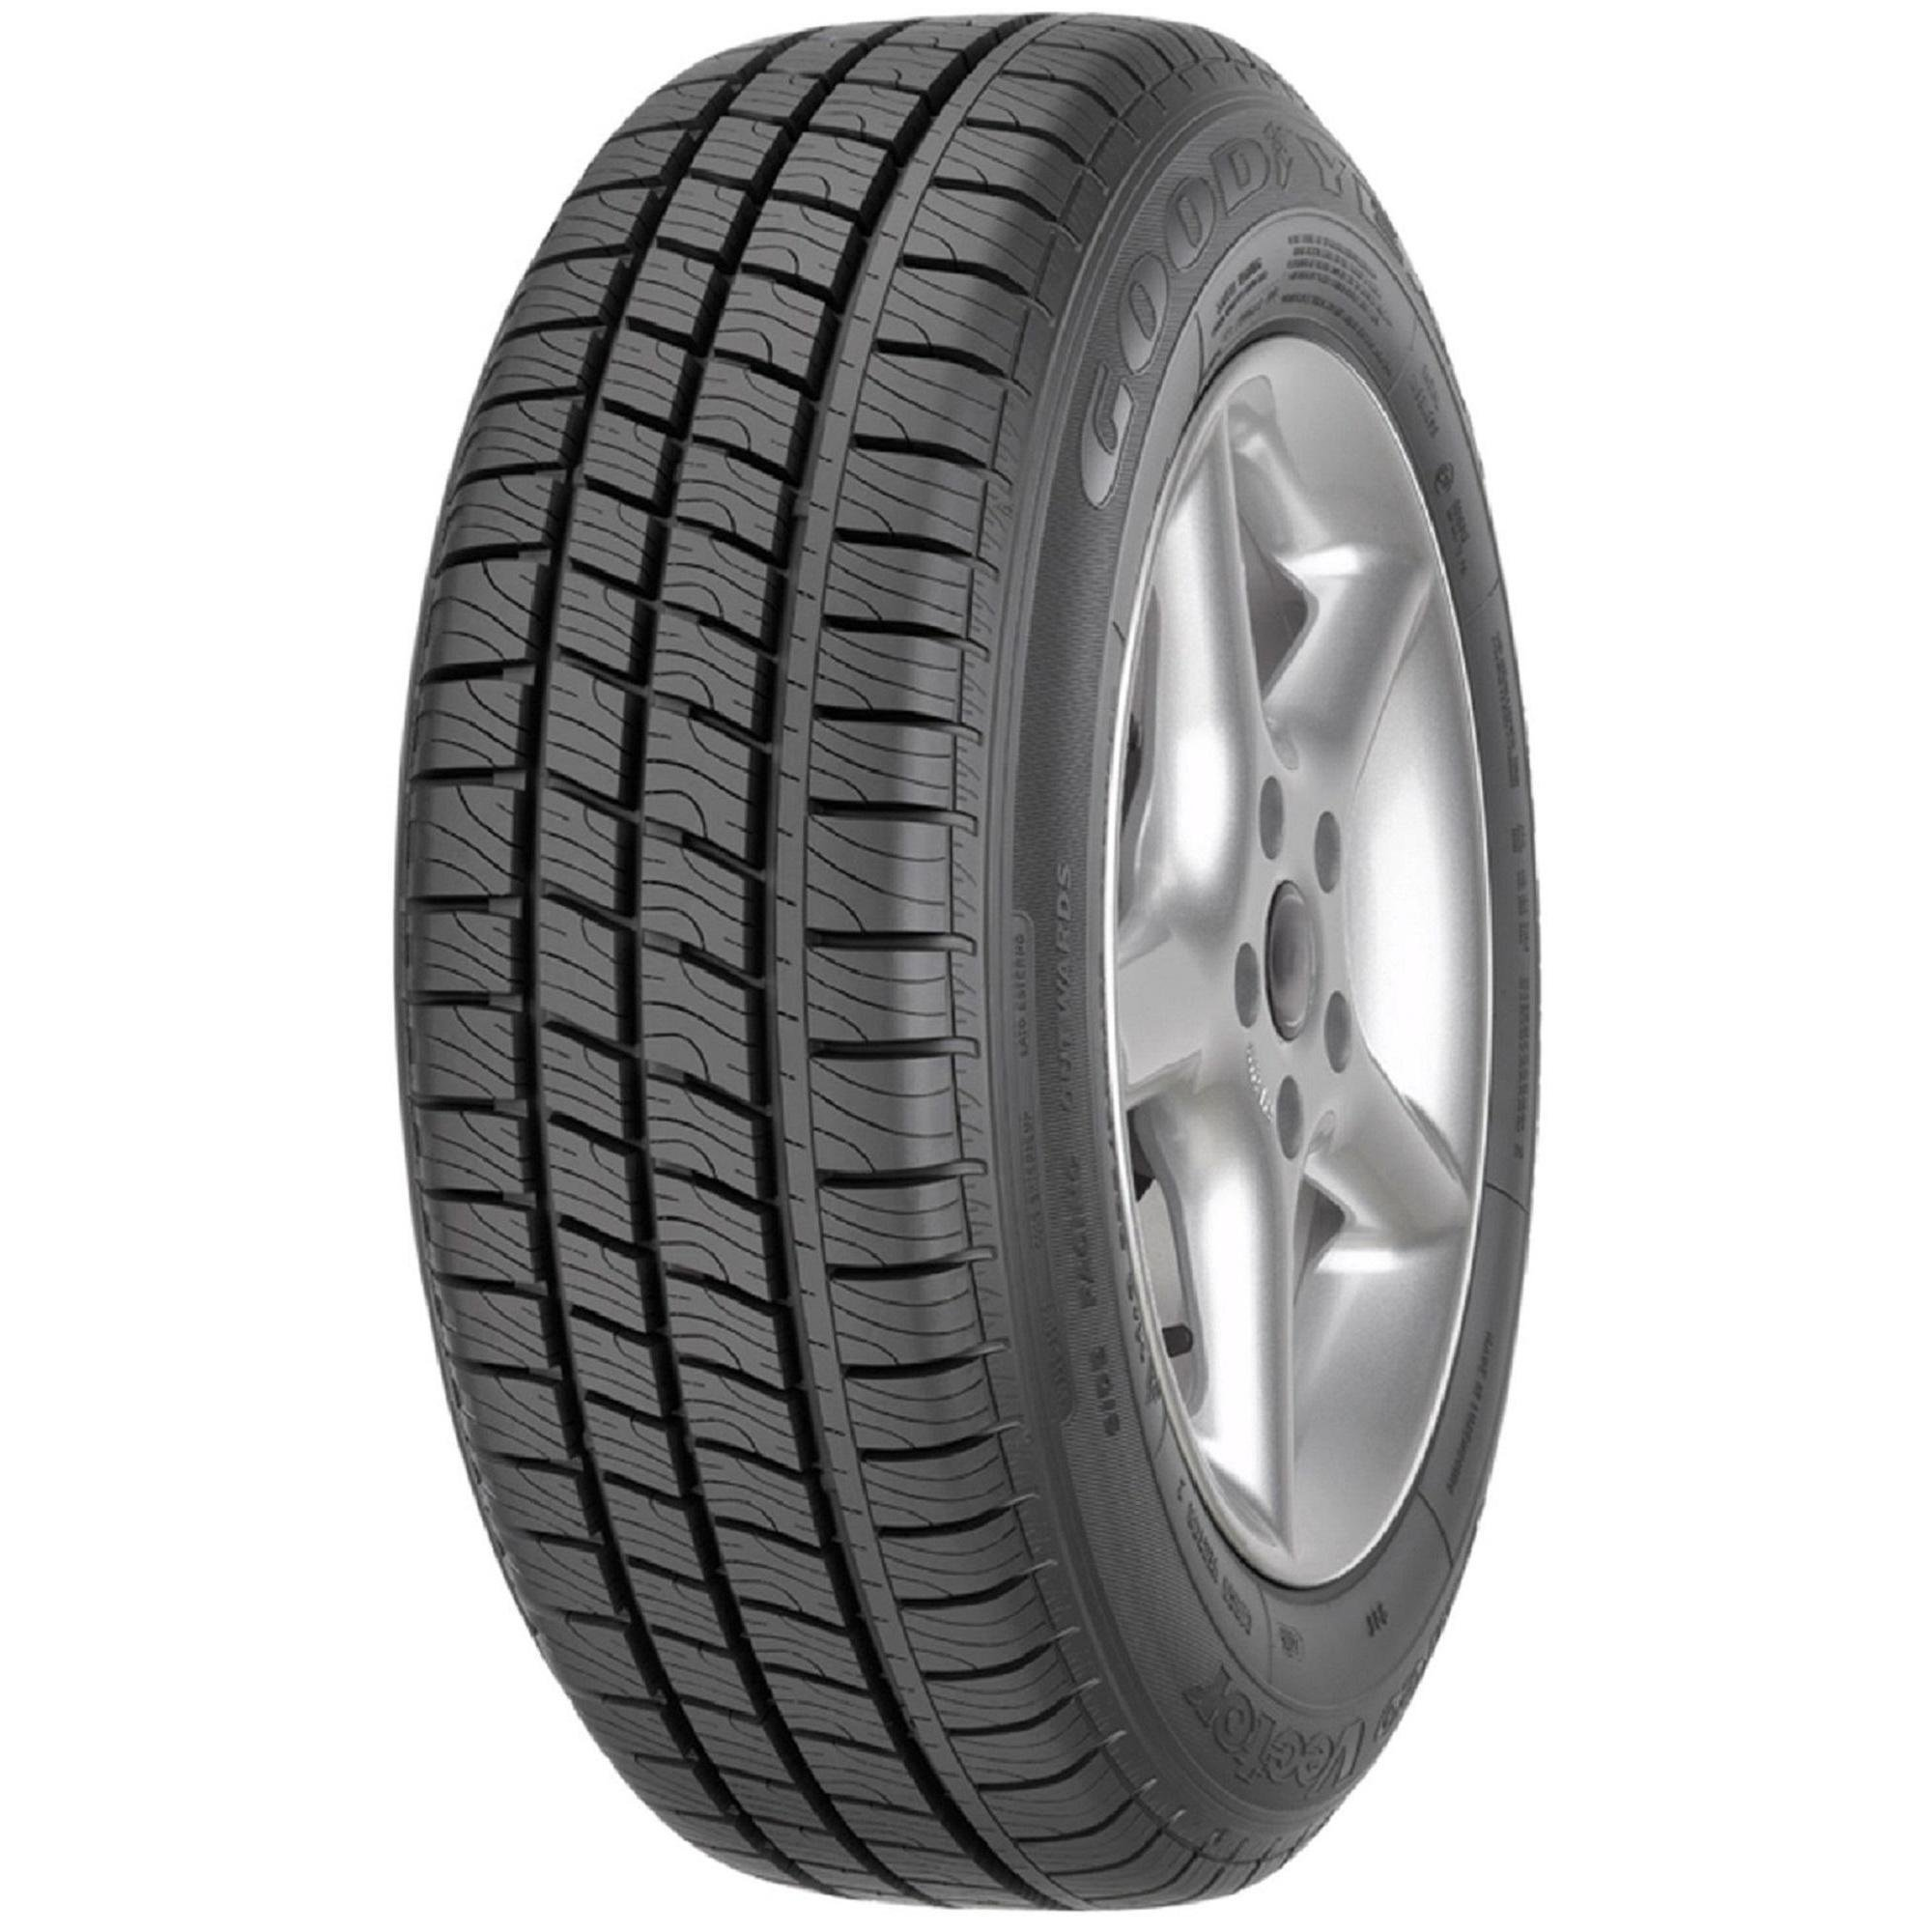 Neumático GOODYEAR CAVE2 225/70R15 112 R